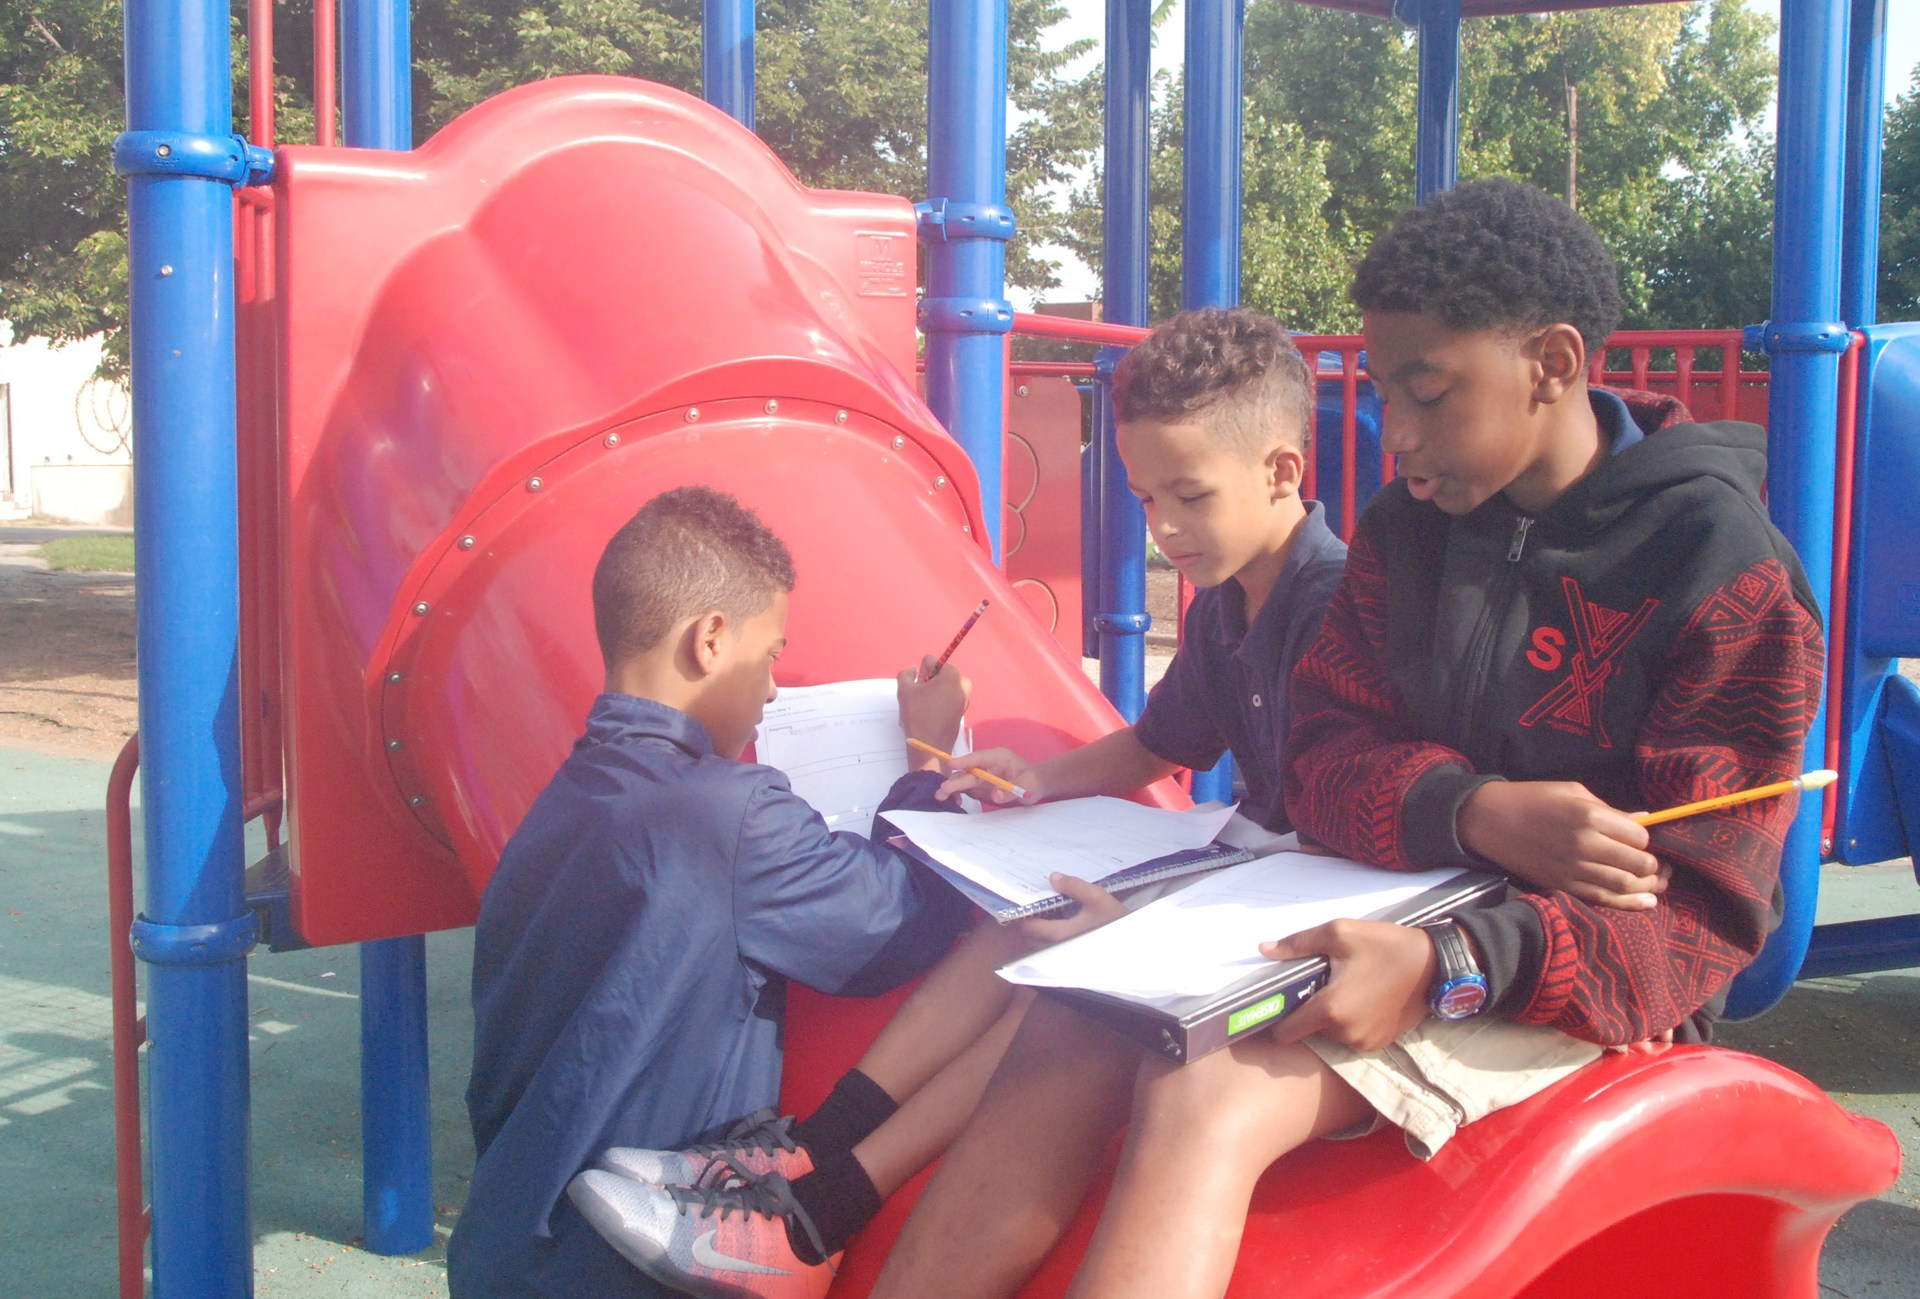 Creative writing on playground